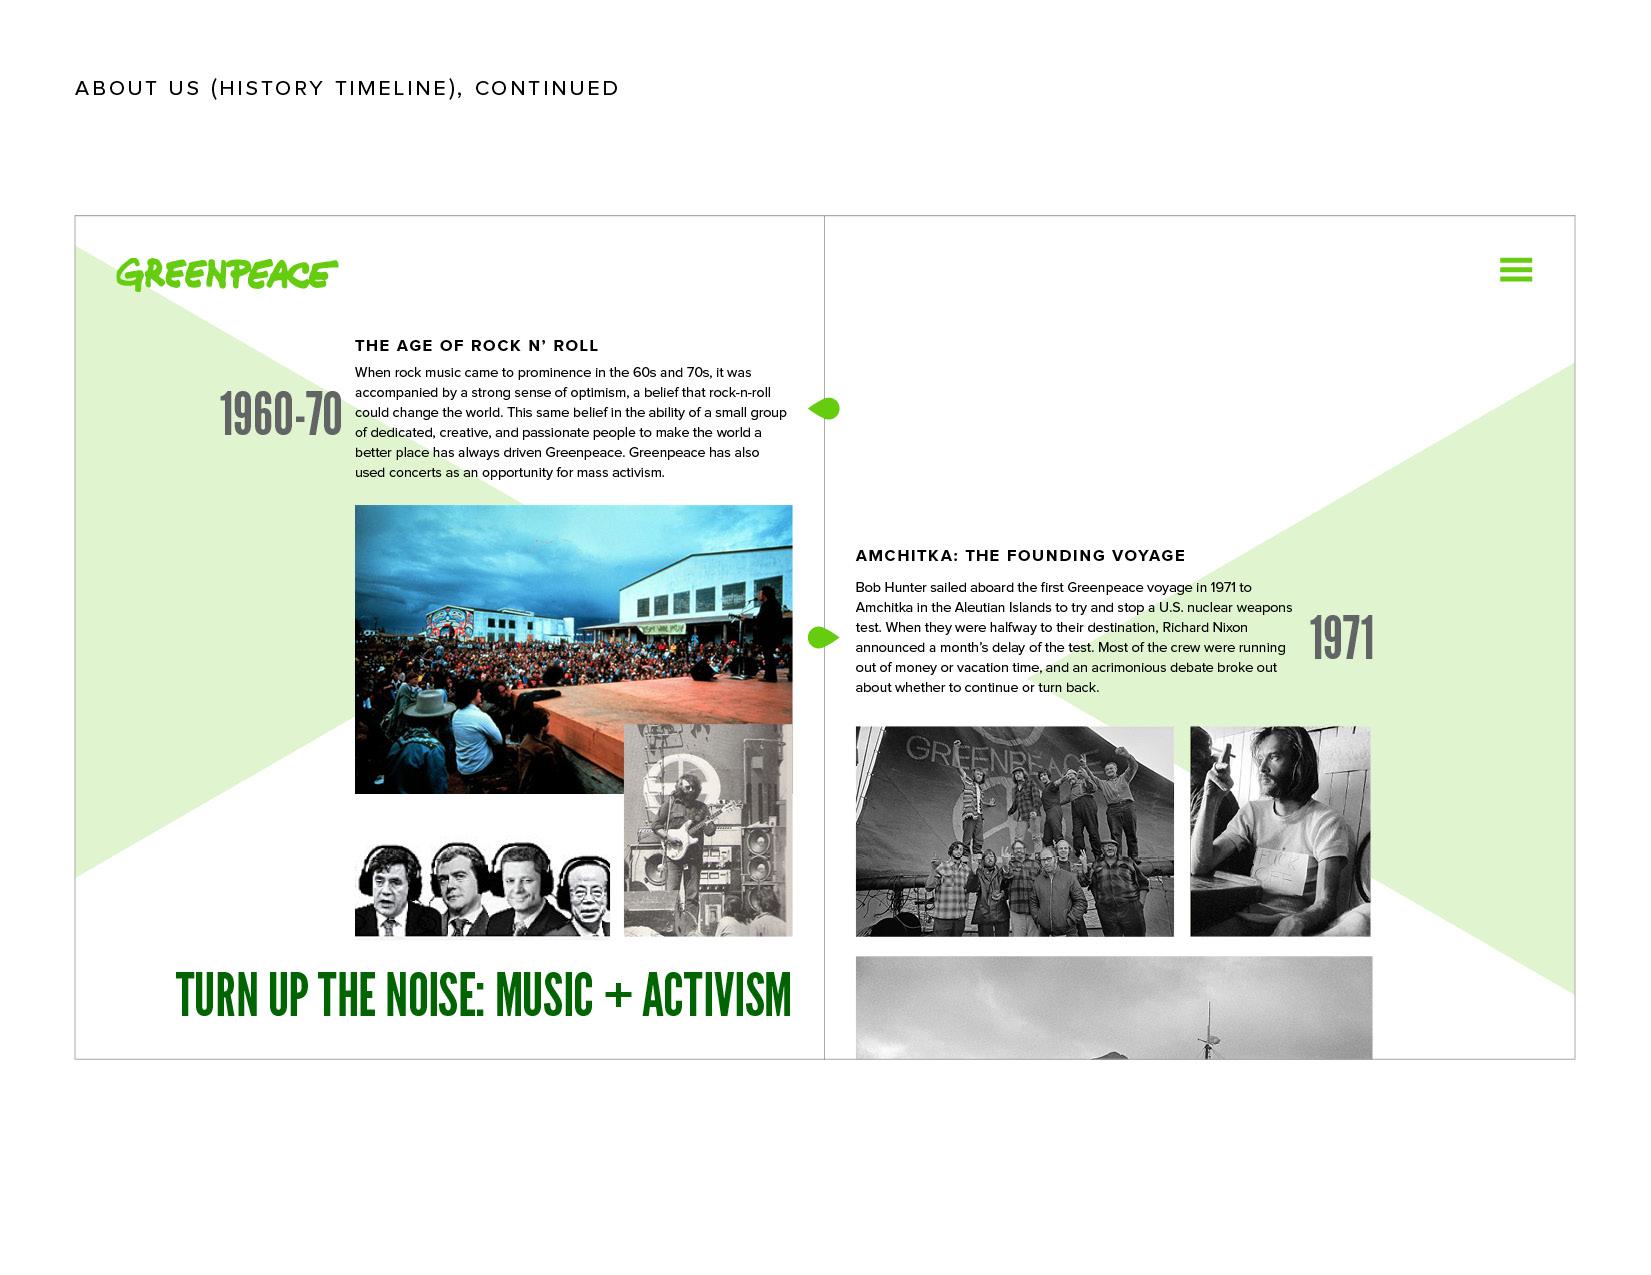 greenpeace16.jpg